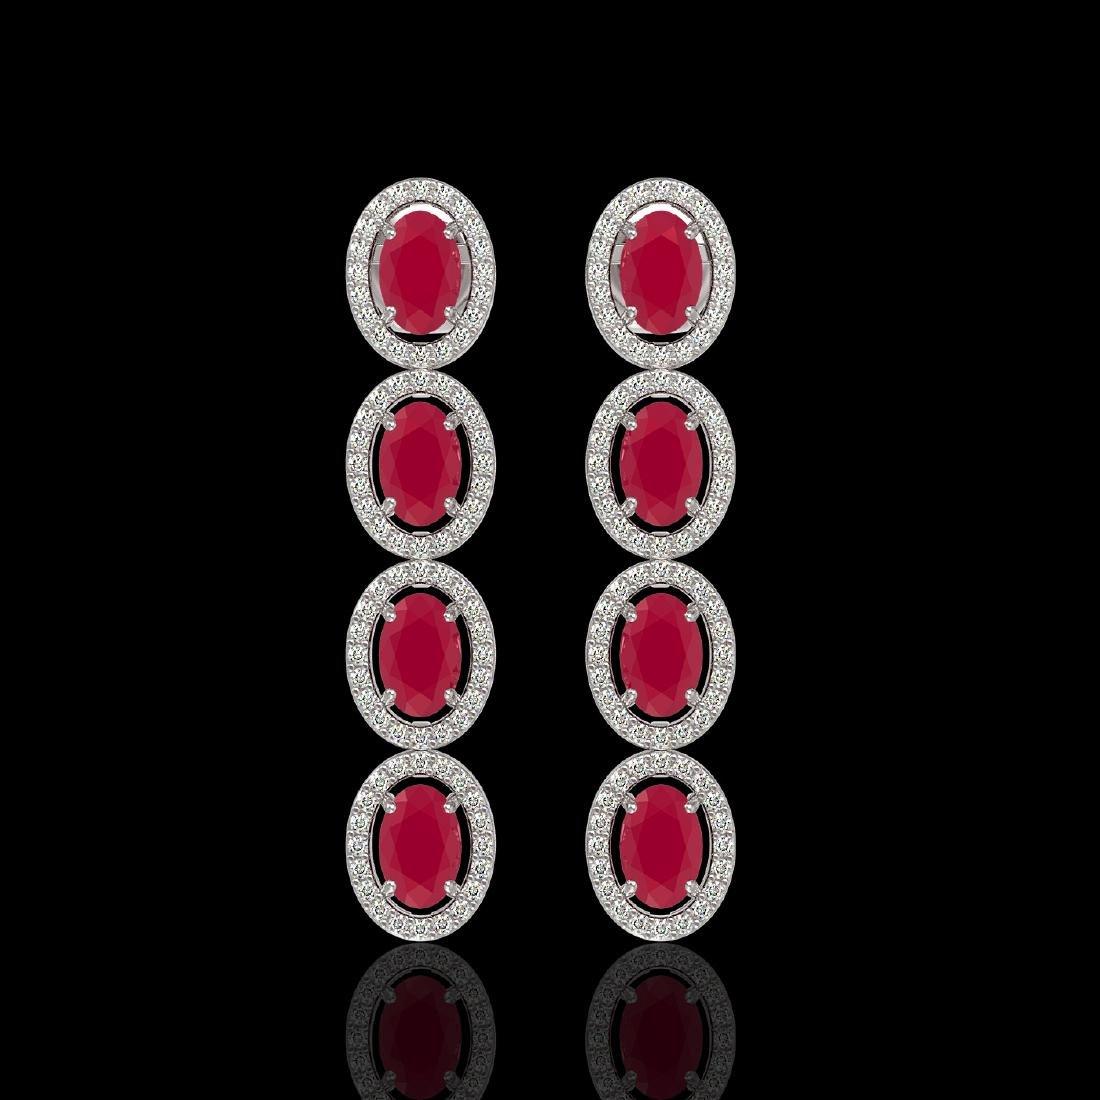 6.47 CTW Ruby & Diamond Halo Earrings 10K White Gold